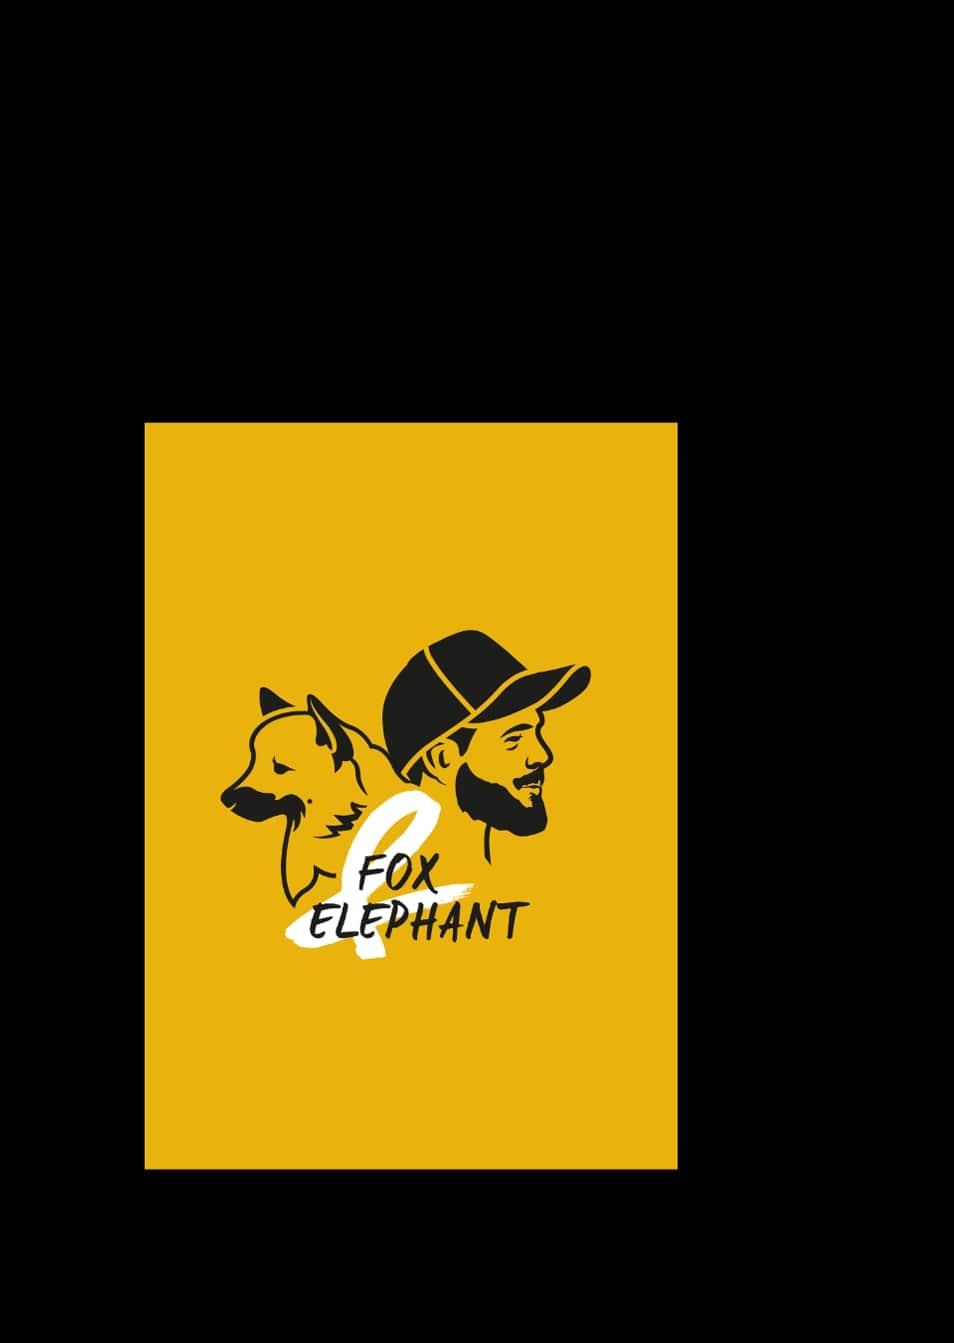 Abbildung des Logos von Fox & Elephant